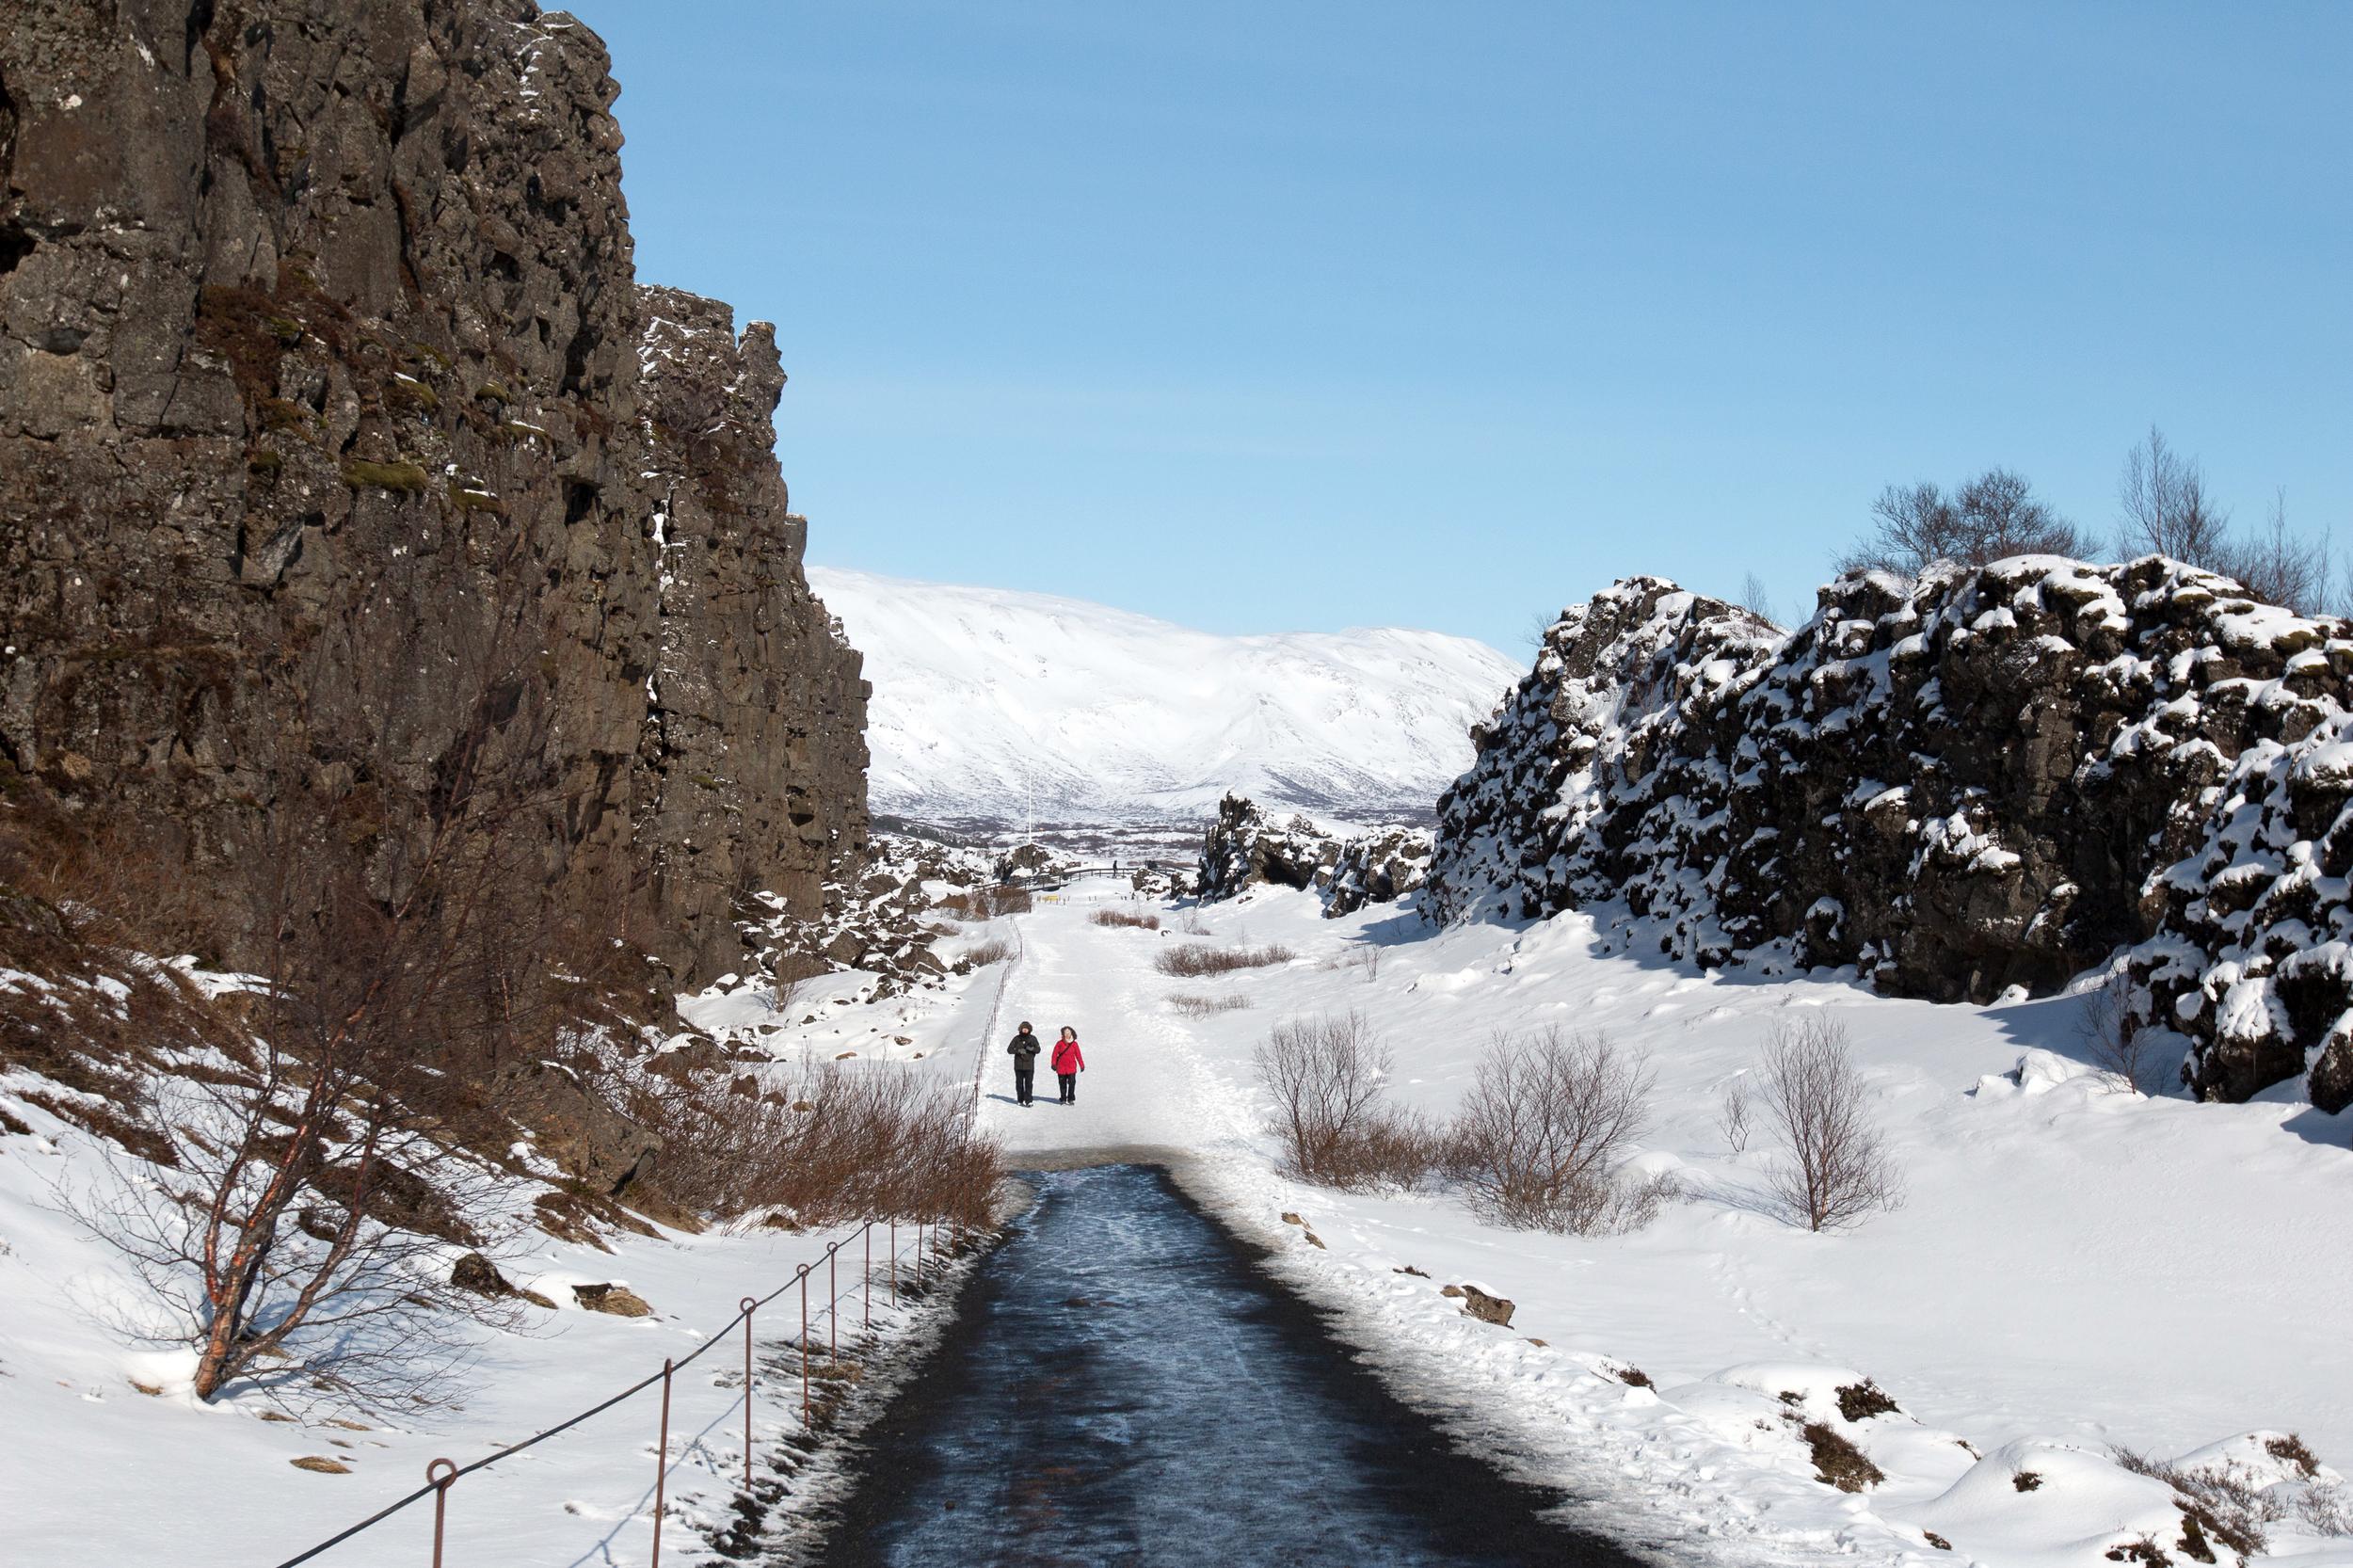 Walking between the American and Eurasian tectonic plates in Þingvellir National Park